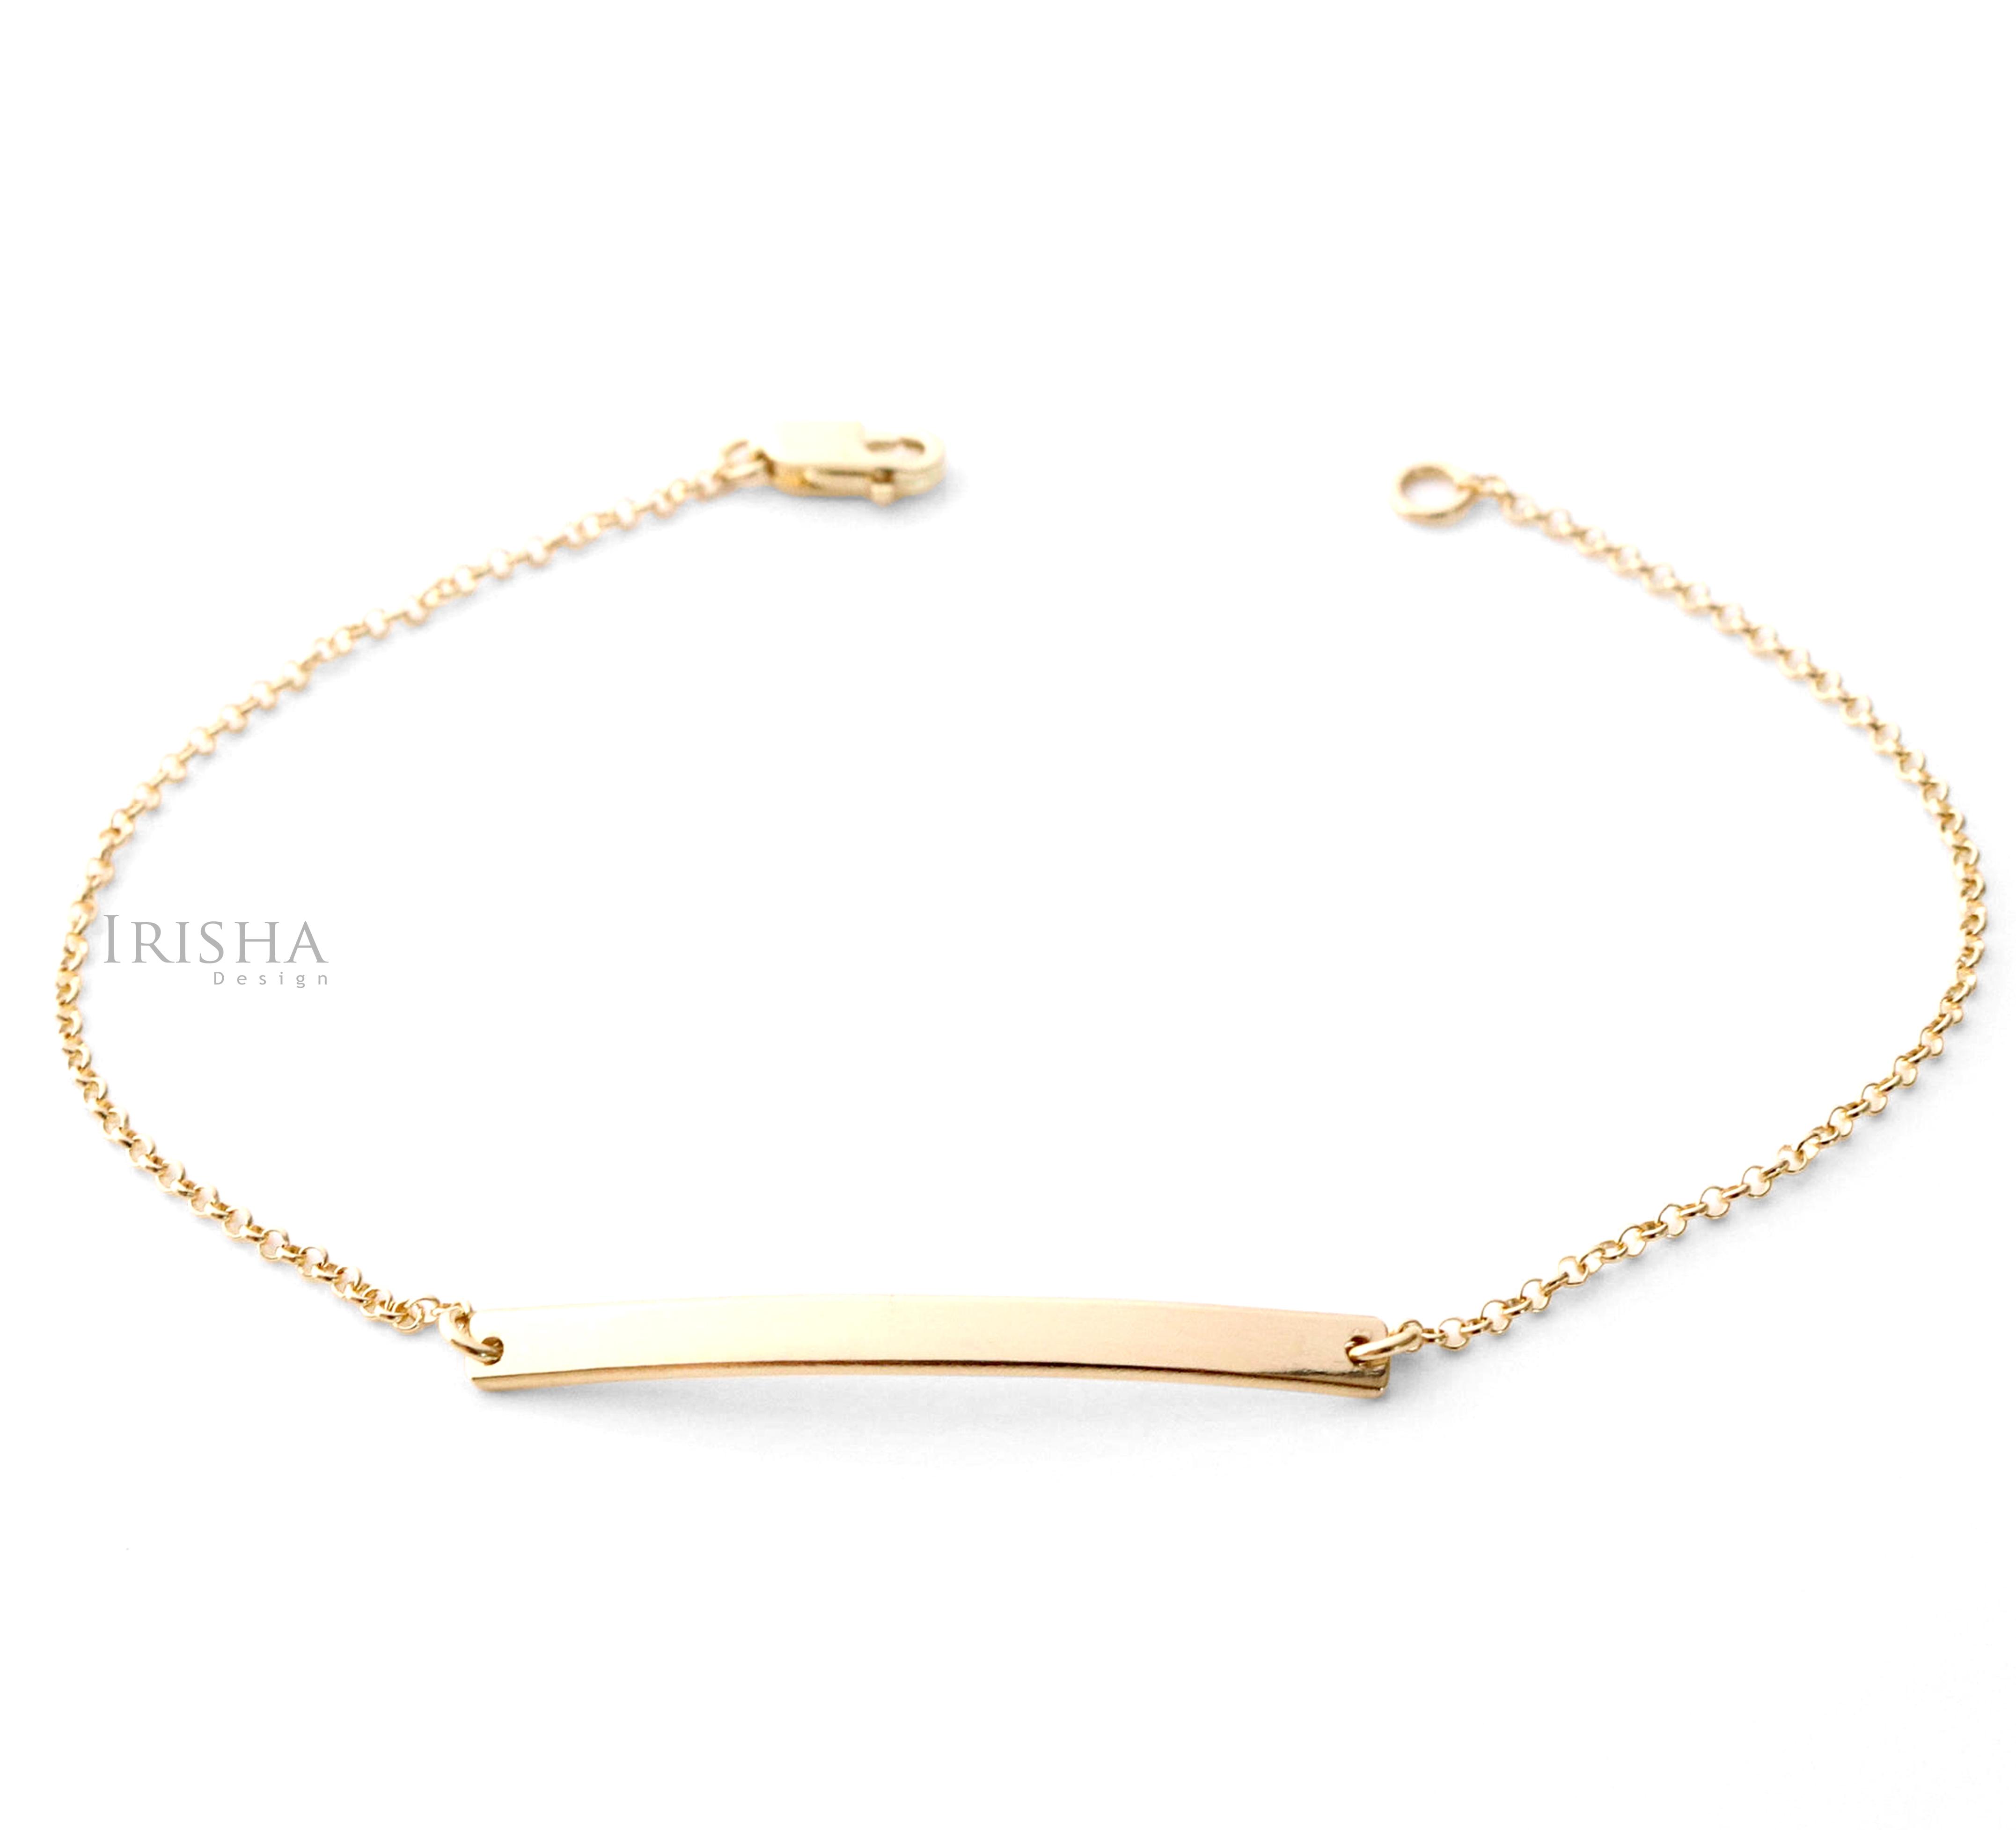 14K Solid Plain Gold Dainty Personalized Engraving Bar Bracelet Fine Jewelry